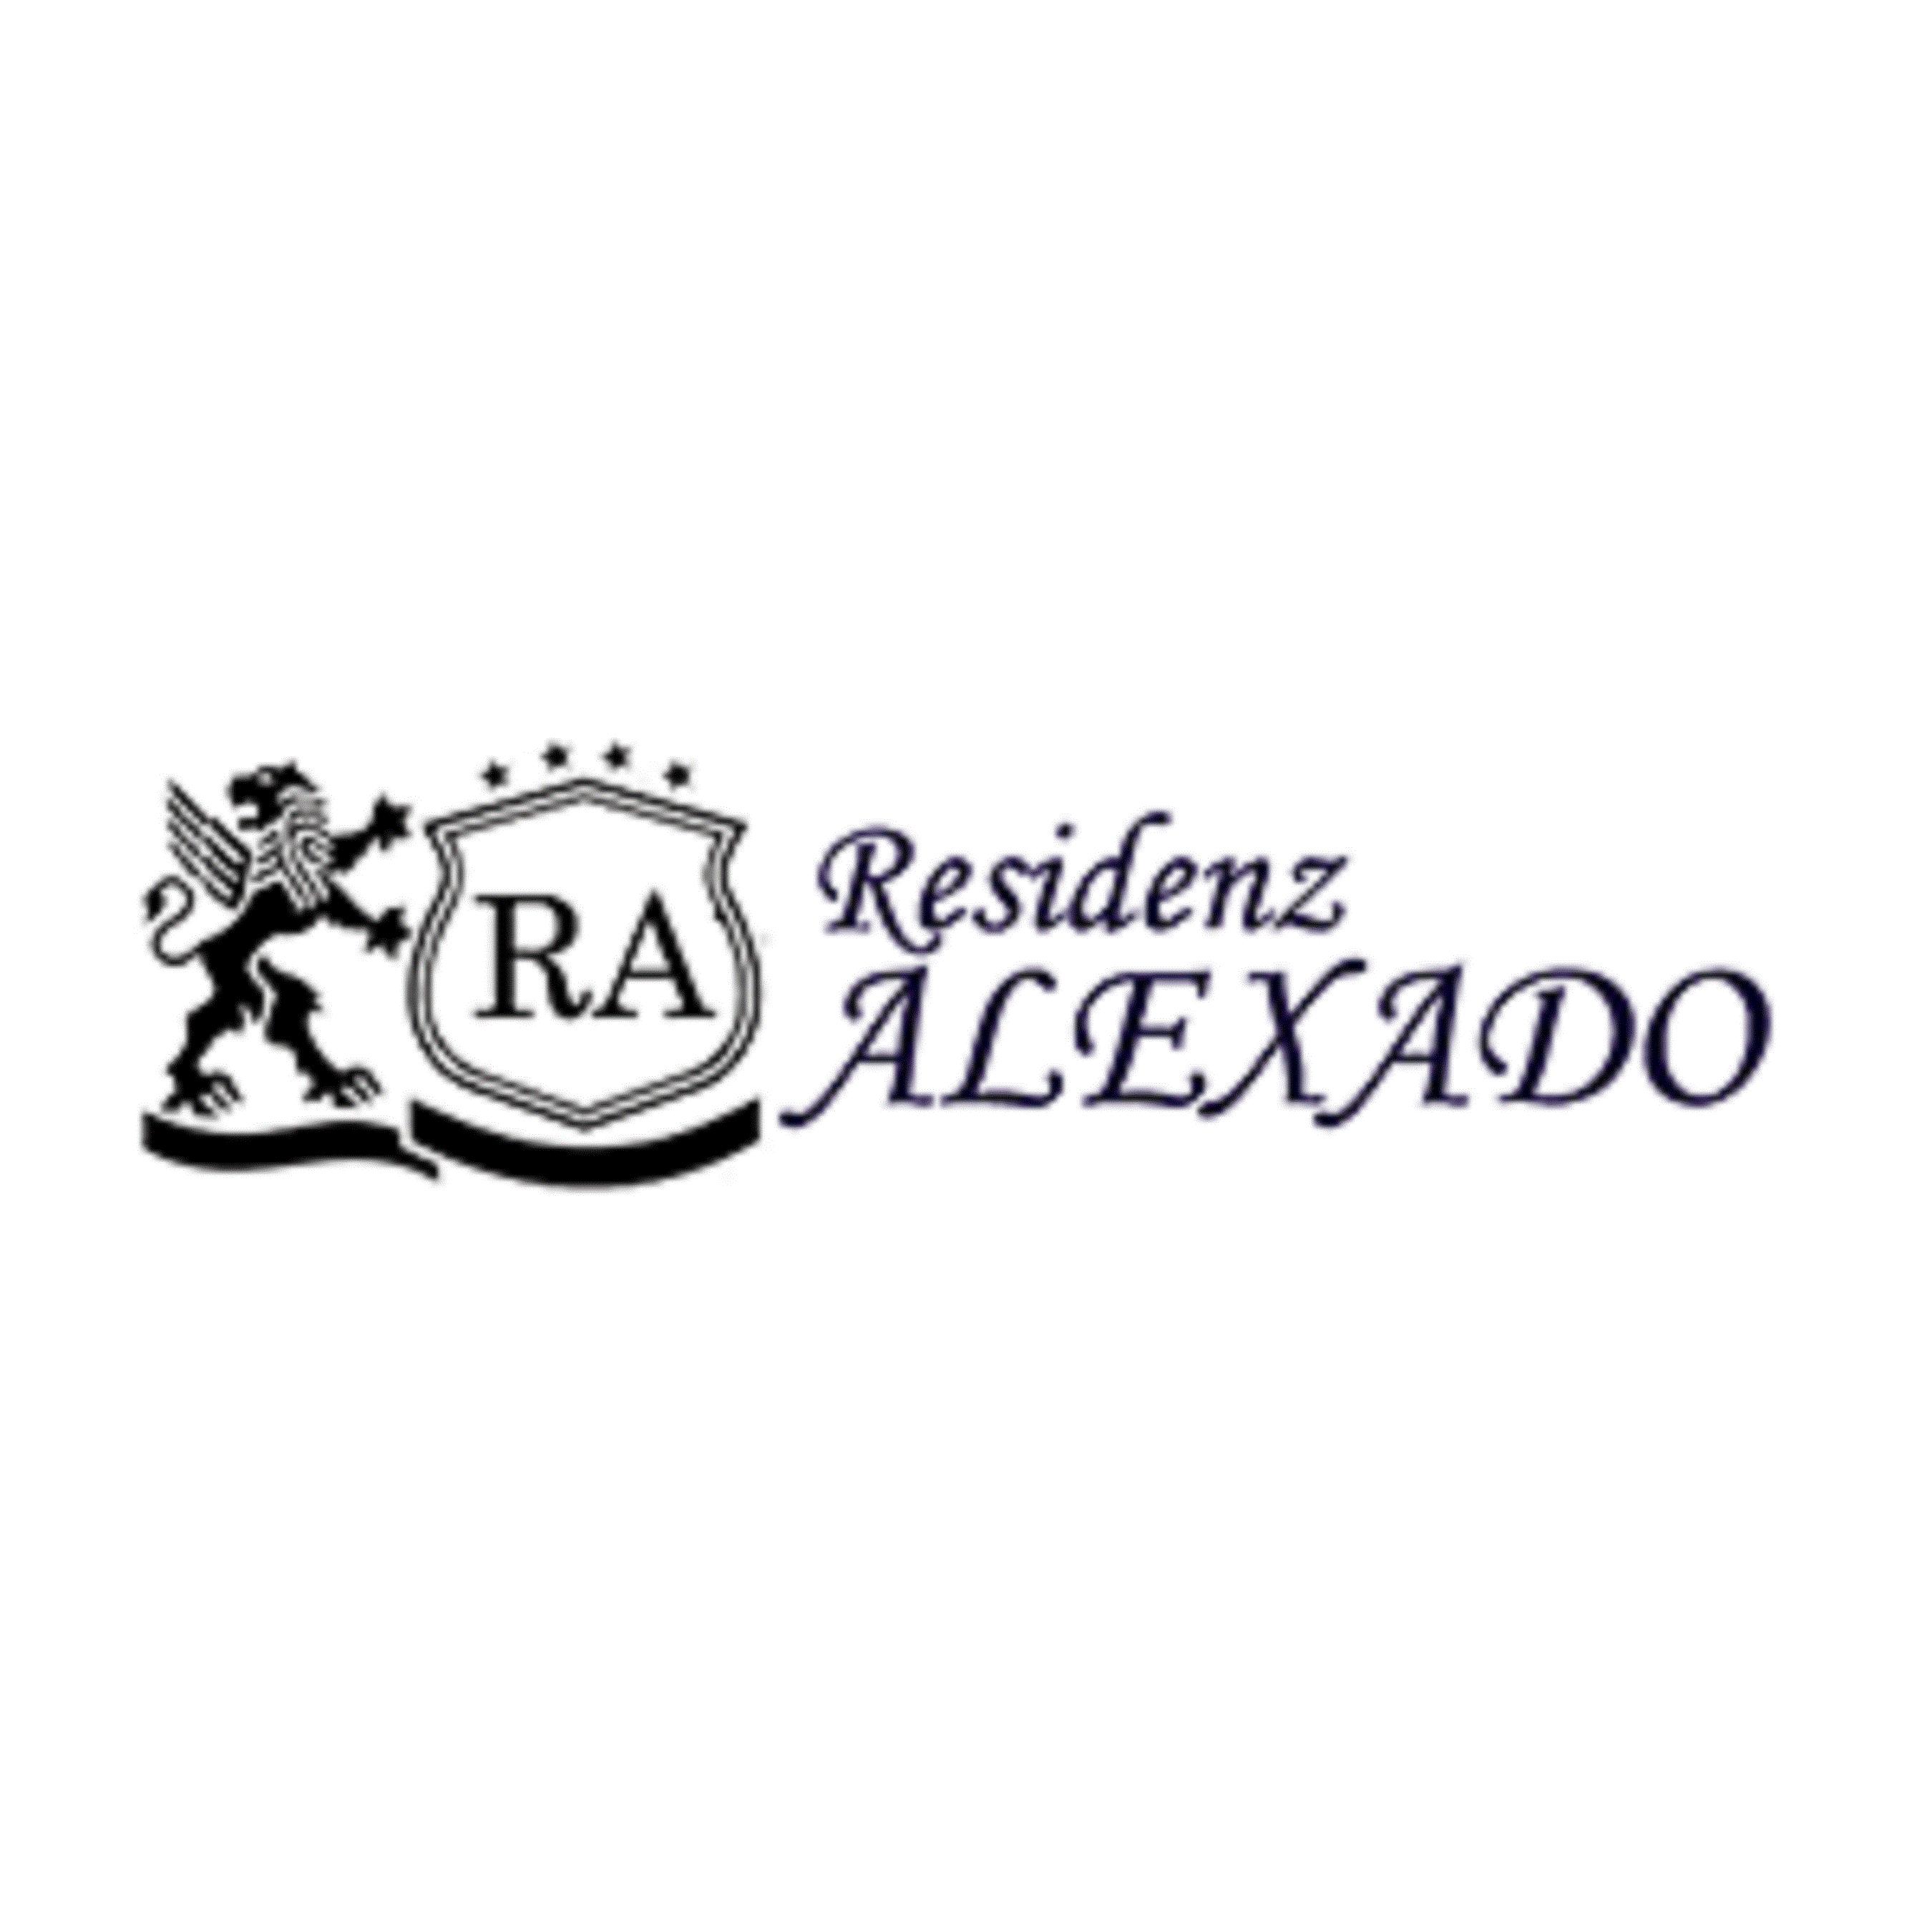 Dr. Donhoeffner GmbH Residenz ALEXADO